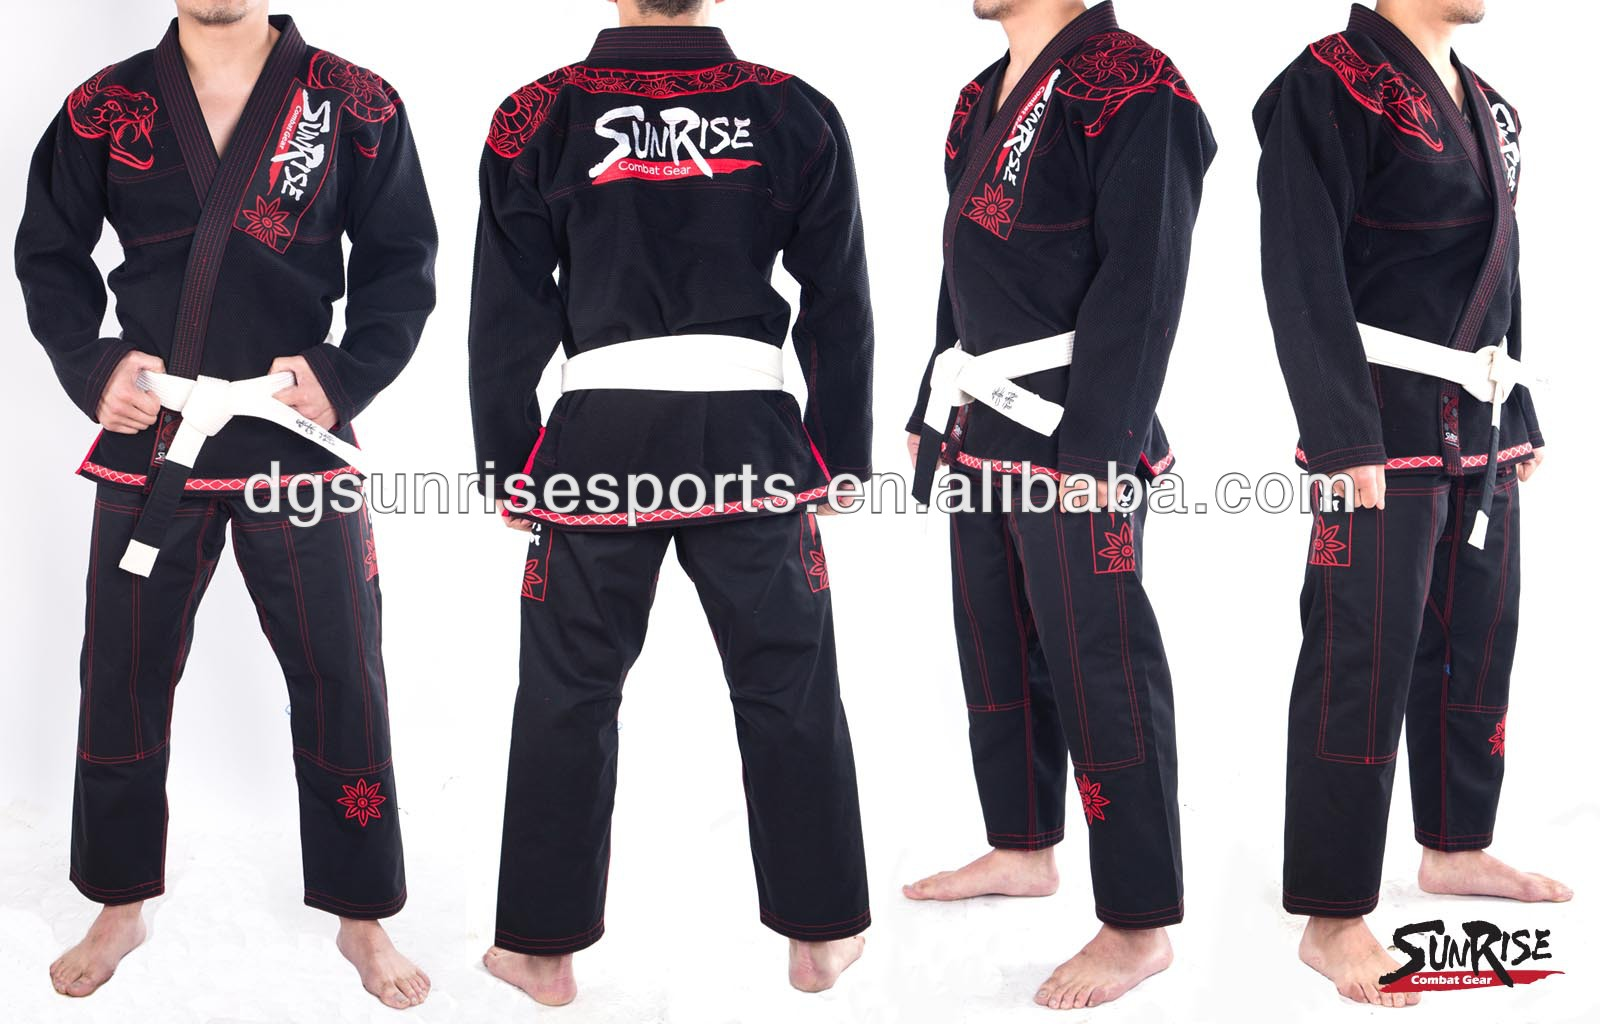 Free Shipping Brazilian Jiu Jitsu Gi 100% Preshrunk Cotton Pearl Weave BJJ Gi Kimonos - Black